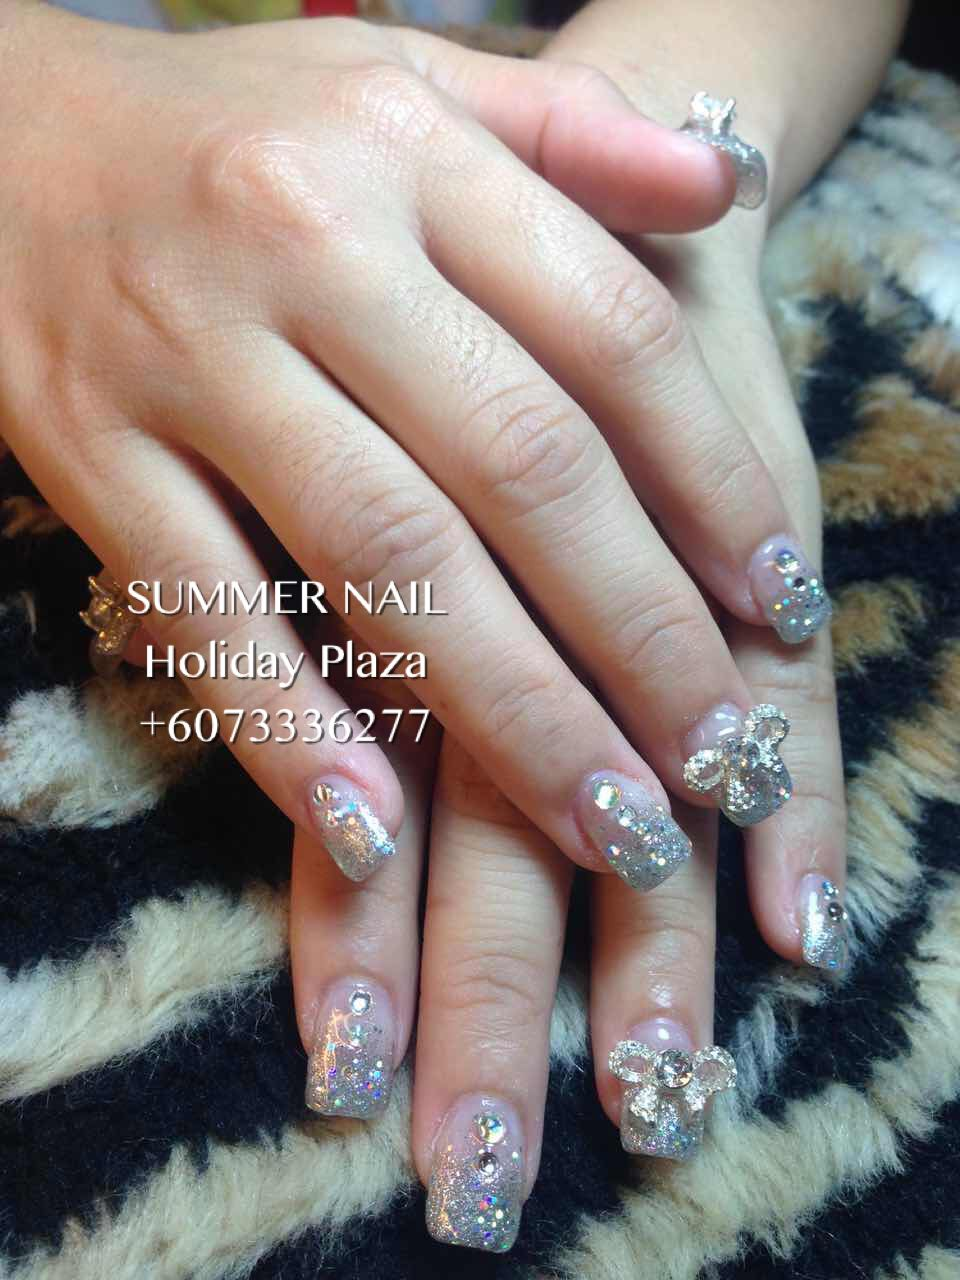 Summer Nail Holiday Plaza Mcdonald S Upstairs 3rd Floor 6073336277 Whatsapp 60163188359 Instagram S Wedding Nails Design Bridal Nails Gel Pedicure